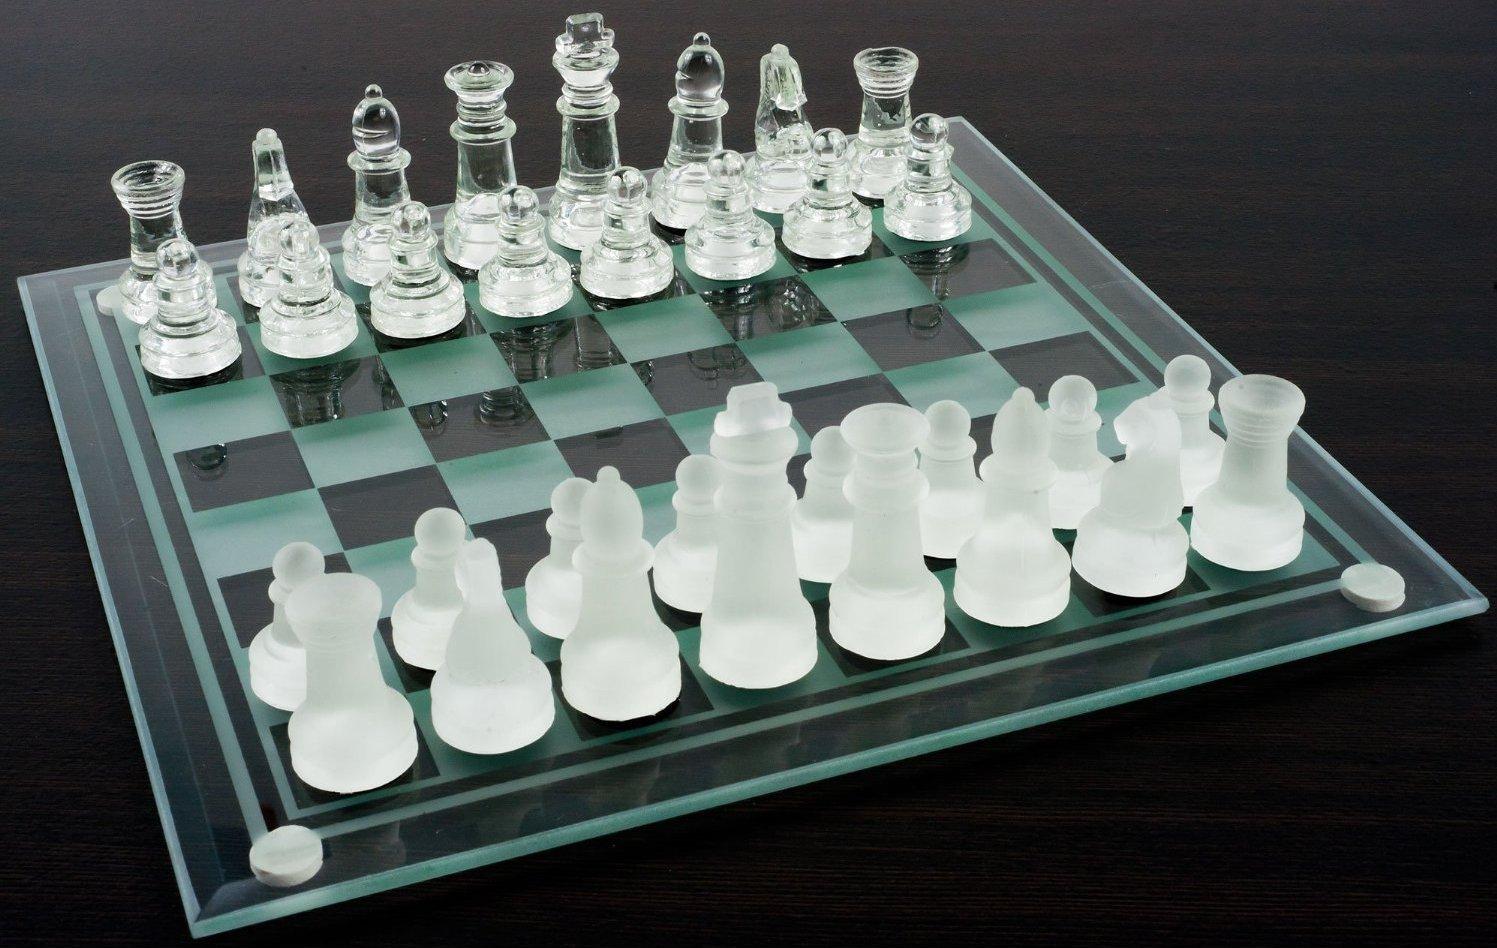 Glass Chess And Checker Board Set